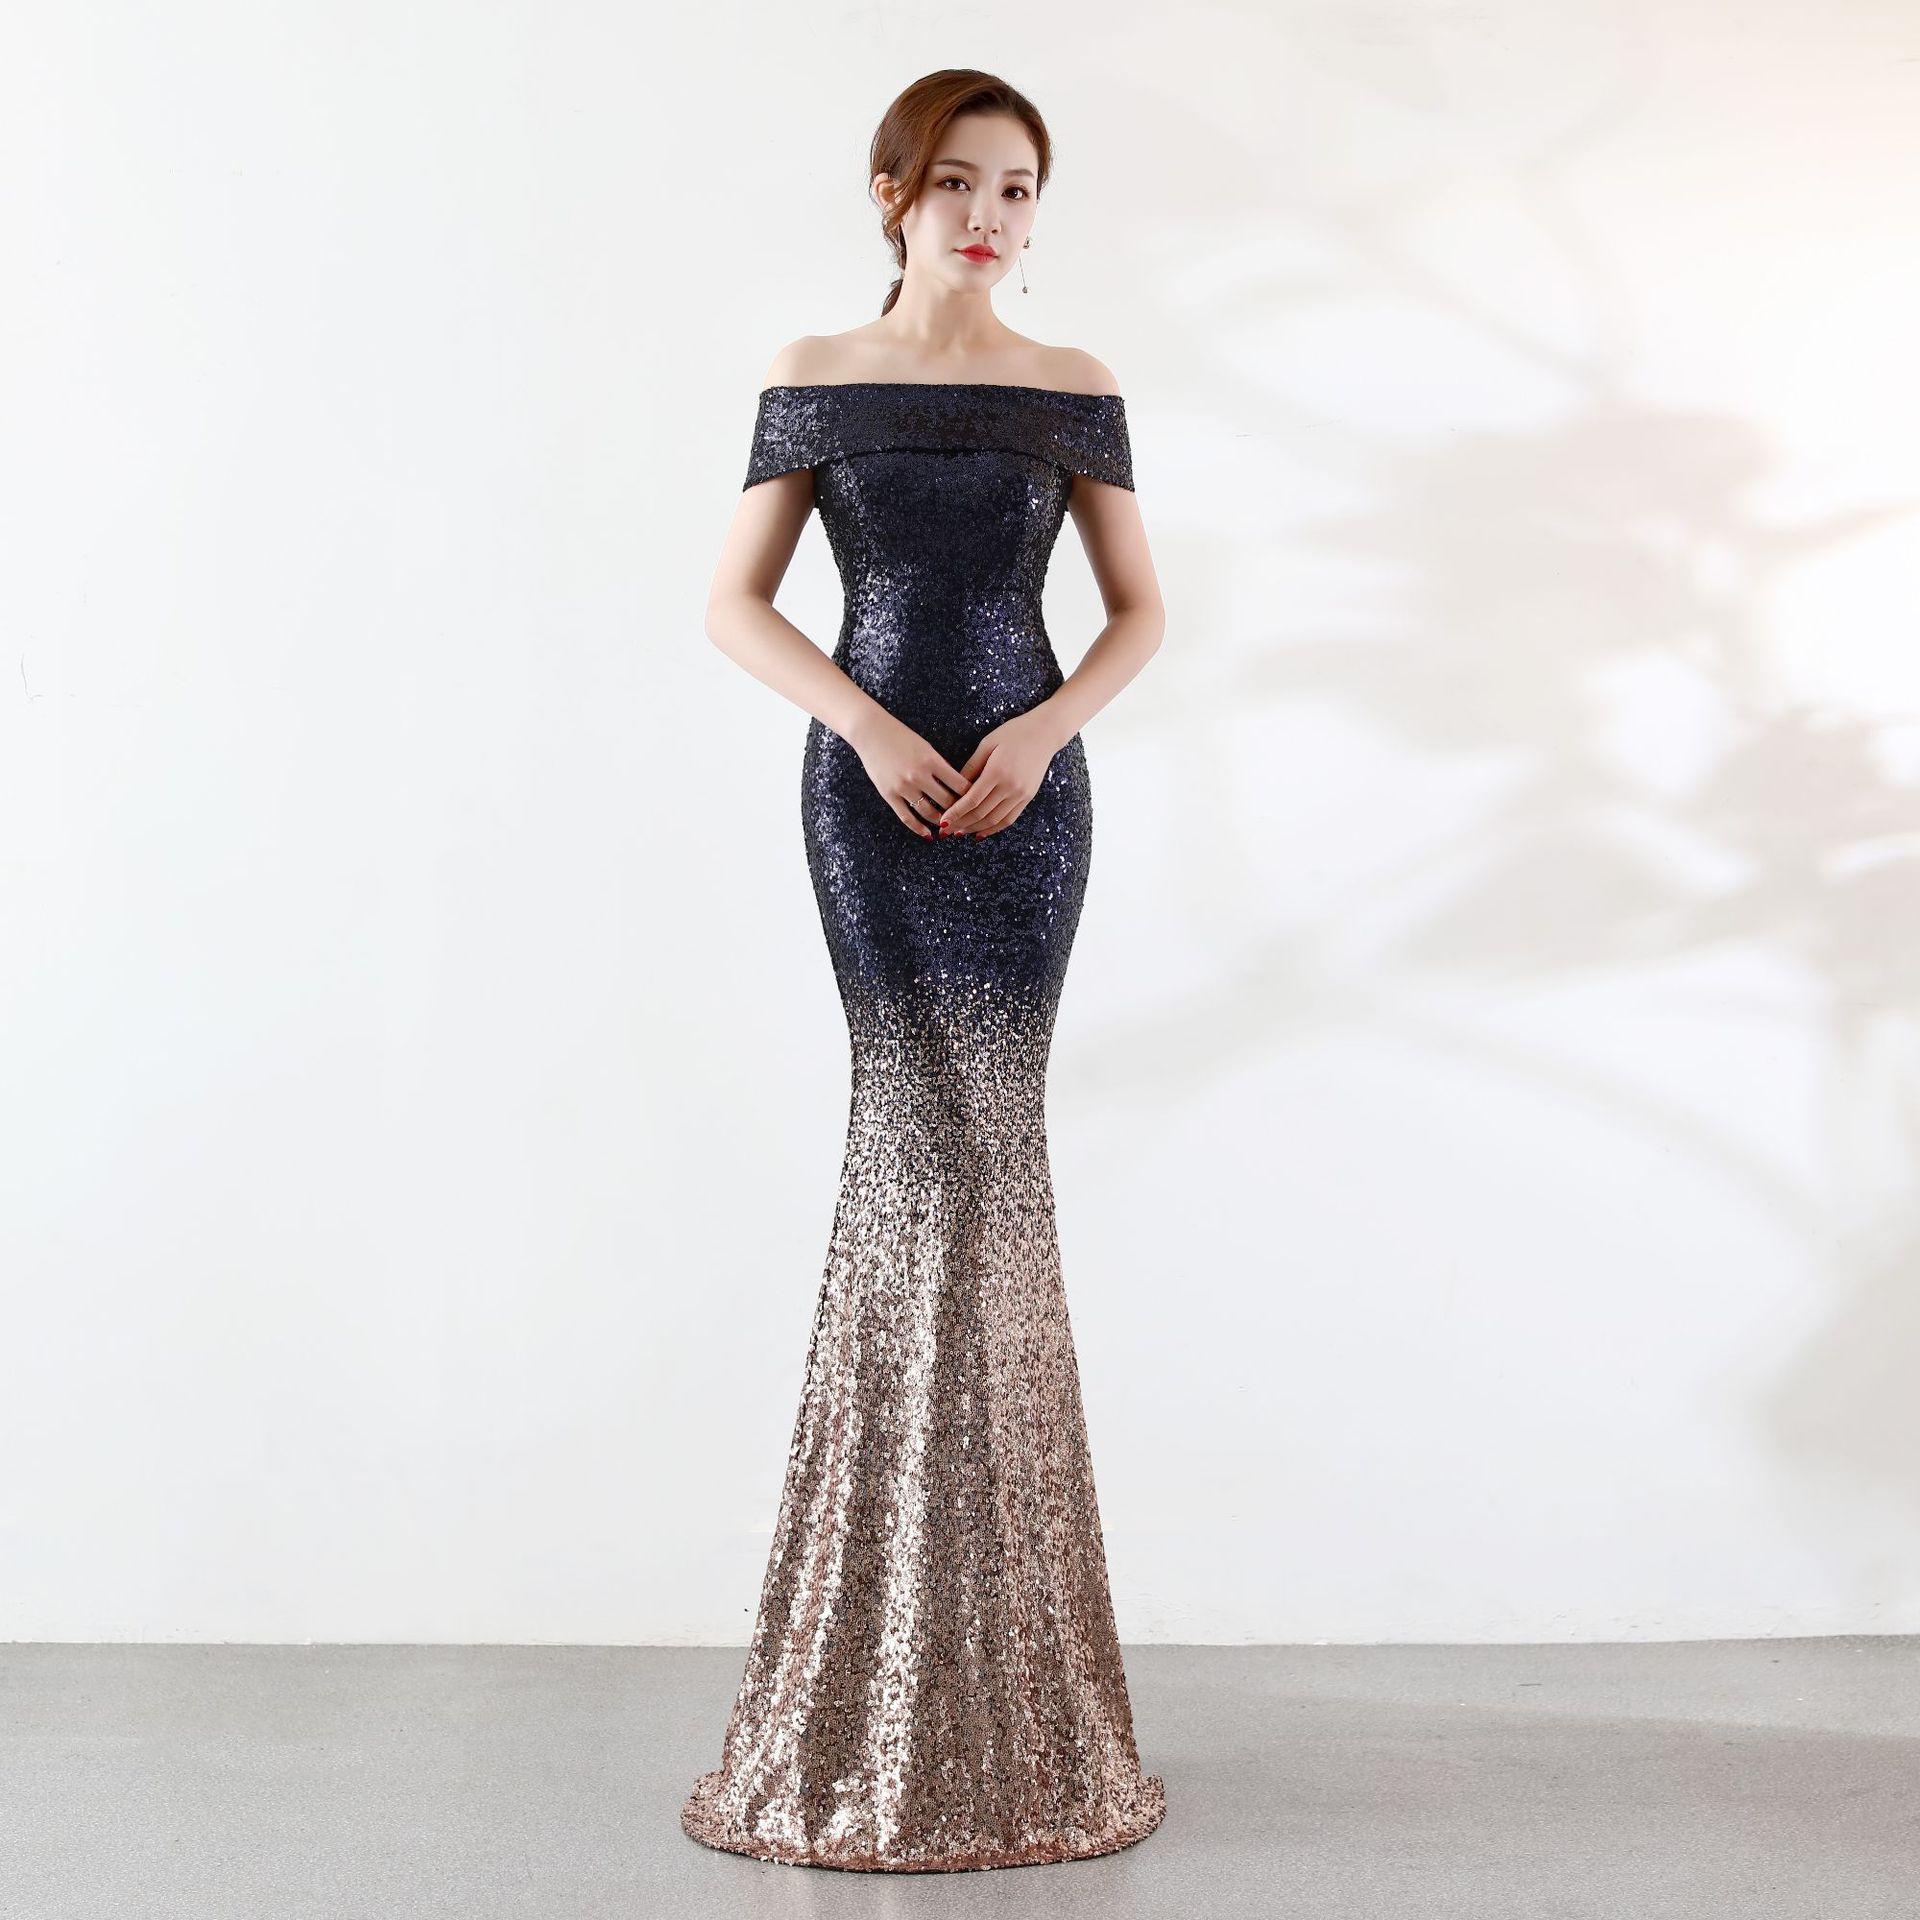 US $20.20 20% OFFNew Sequin Mermaid Long Dress Off the Shoulder Formal  Dress Women Elegant Robe Soiree Dubai Kleider Damen Abendkleid